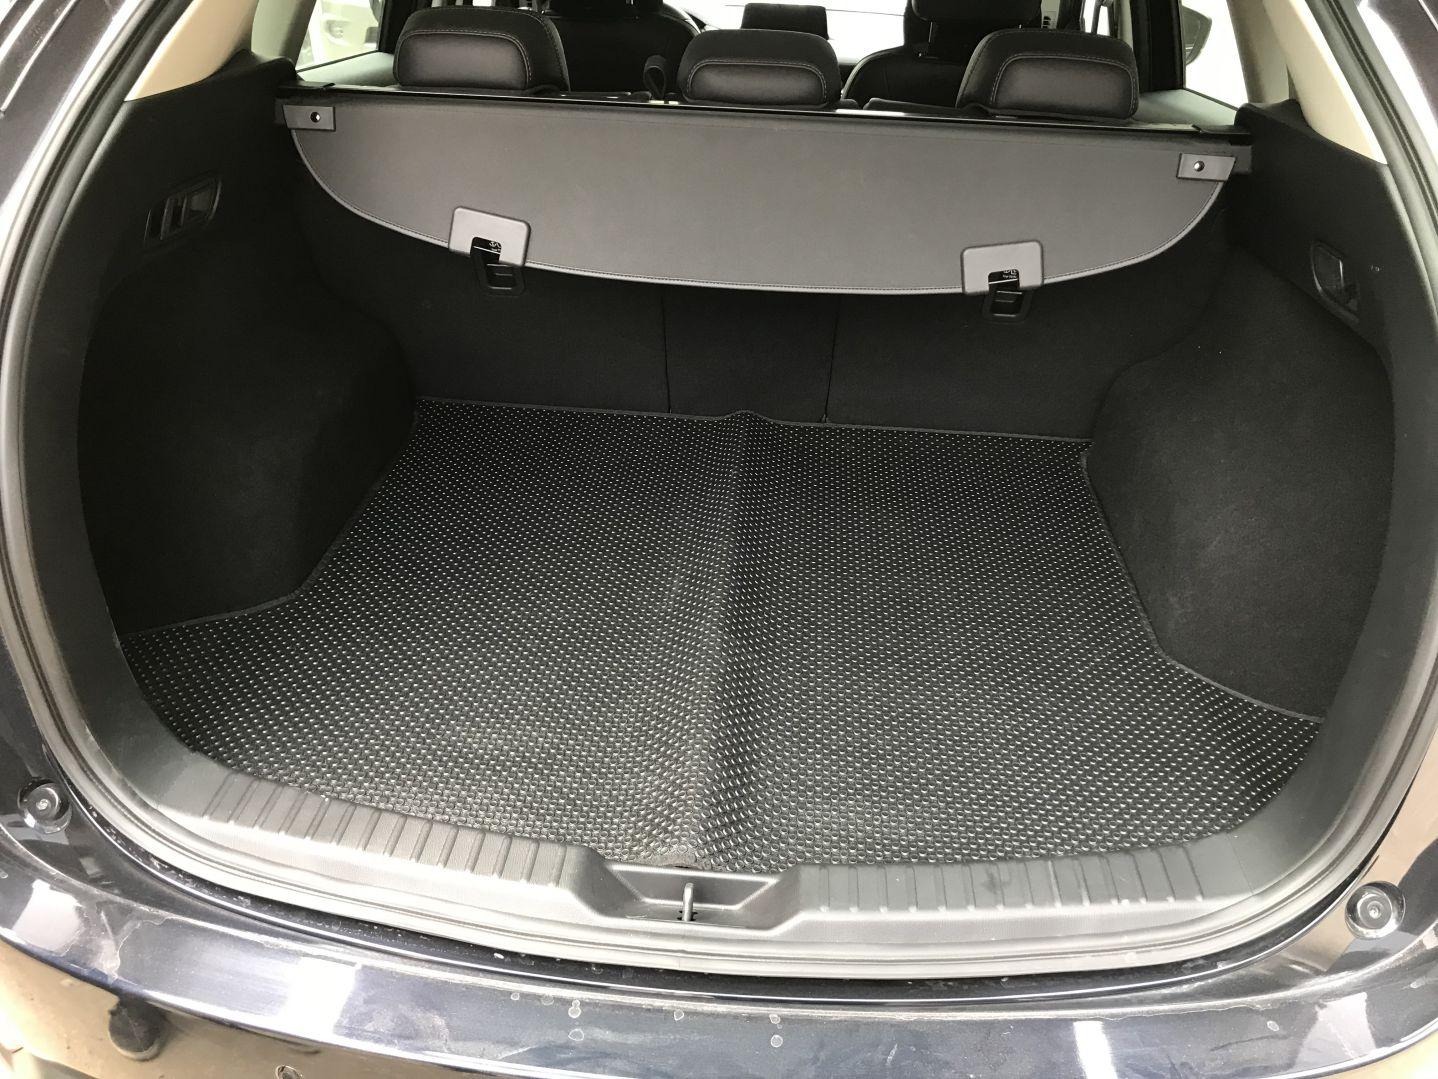 Thảm lót cốp Mazda CX-5 2018